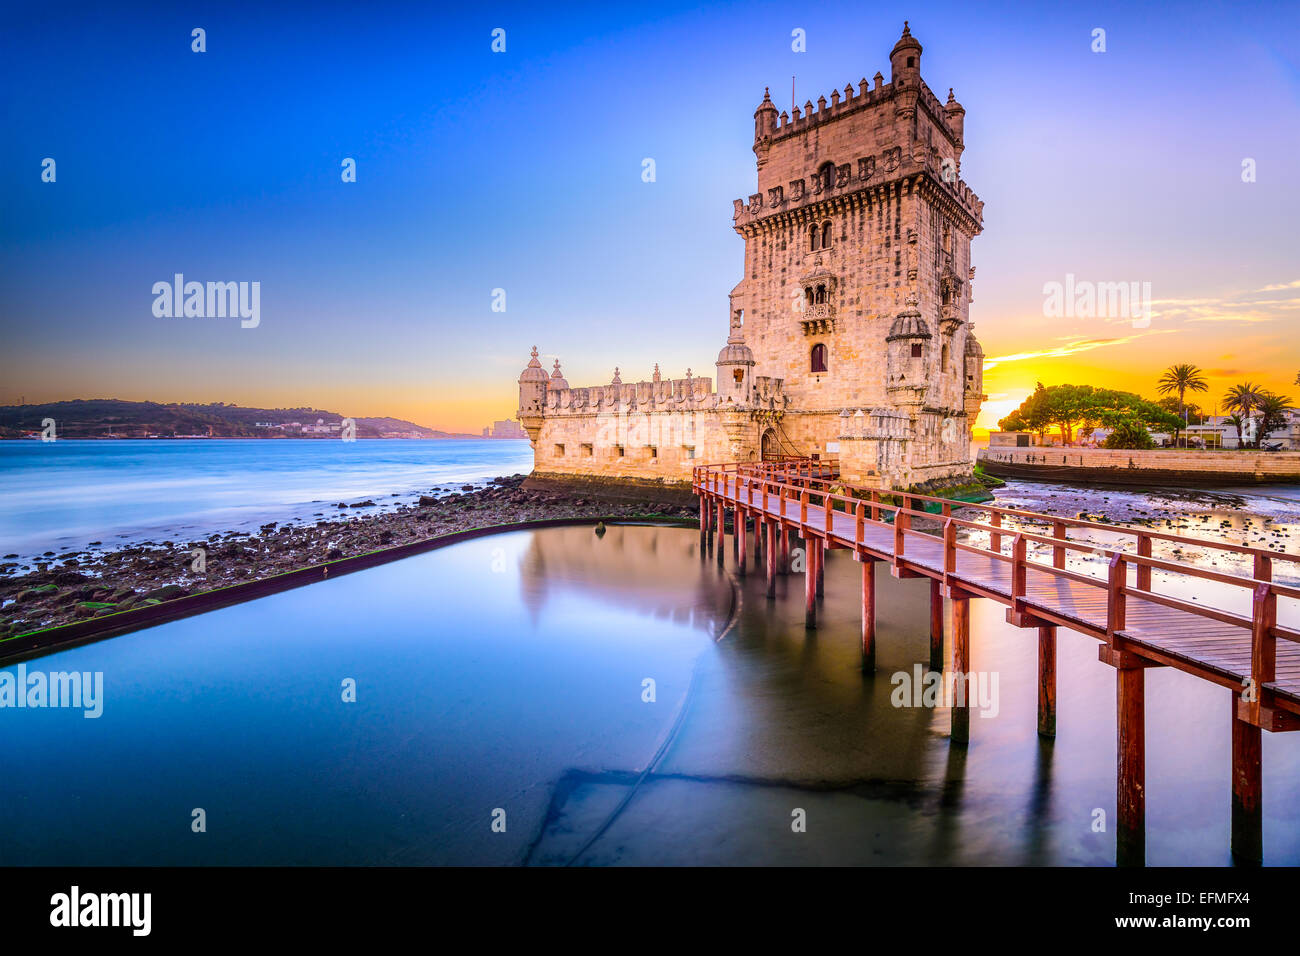 Lissabon, Portugal am Turm von Belem am Fluss Tejo. Stockbild